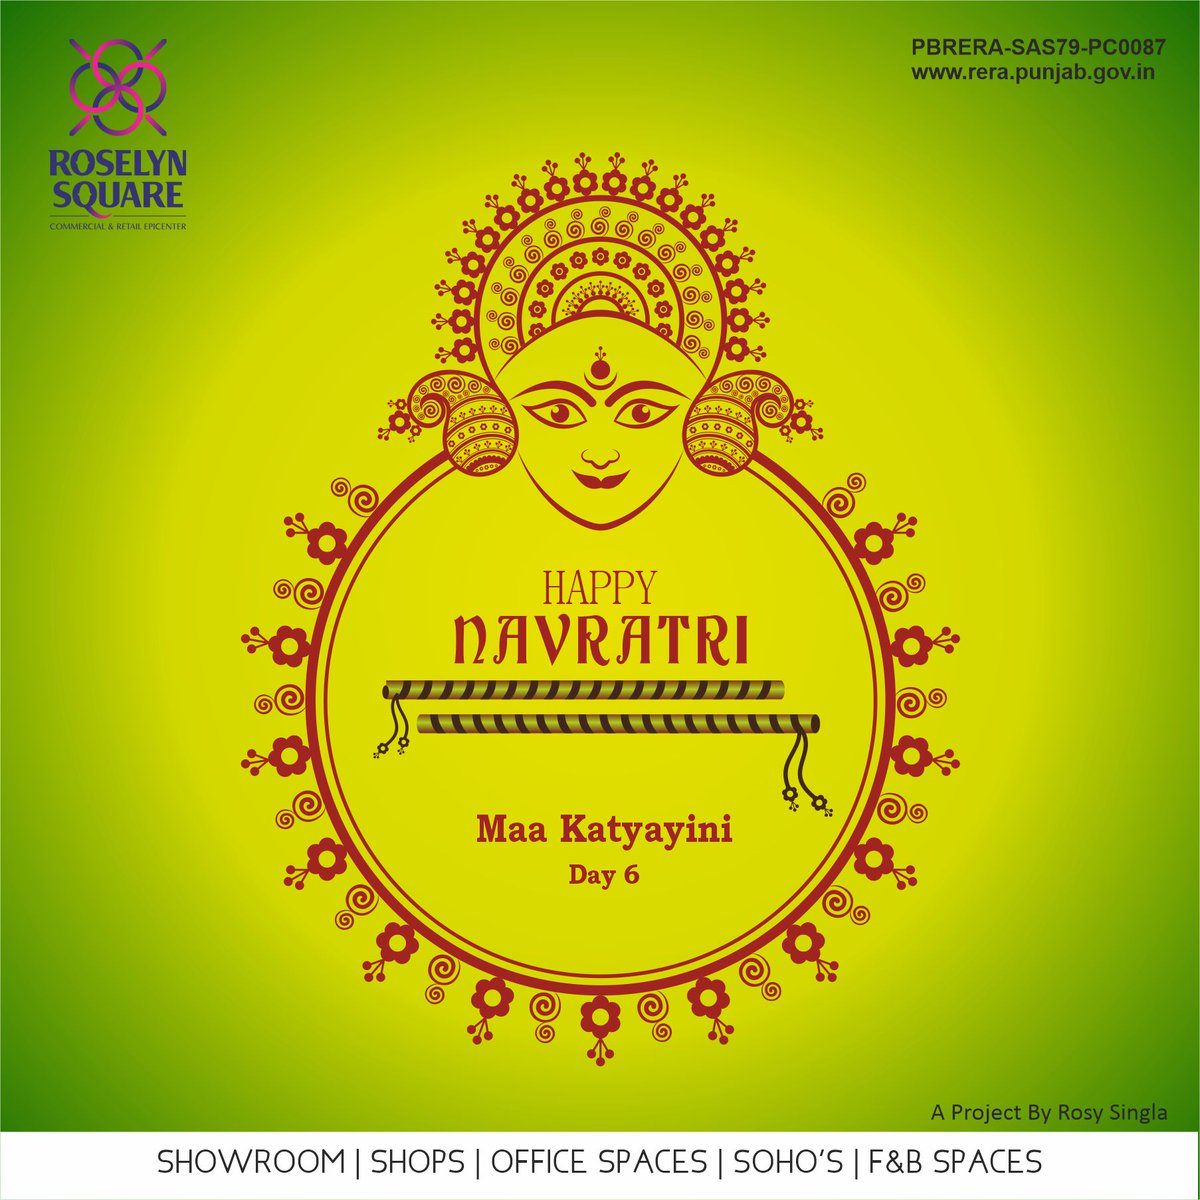 May maa Katyayini bless you with peace, happiness and wealth this Festive Season.  Happy 6th Day of Navratri!  #Maakatyayini #Roselynsquare #Peace #Happiness #Wealth #Happynavratri #CommercialPlaza #Zirakpur